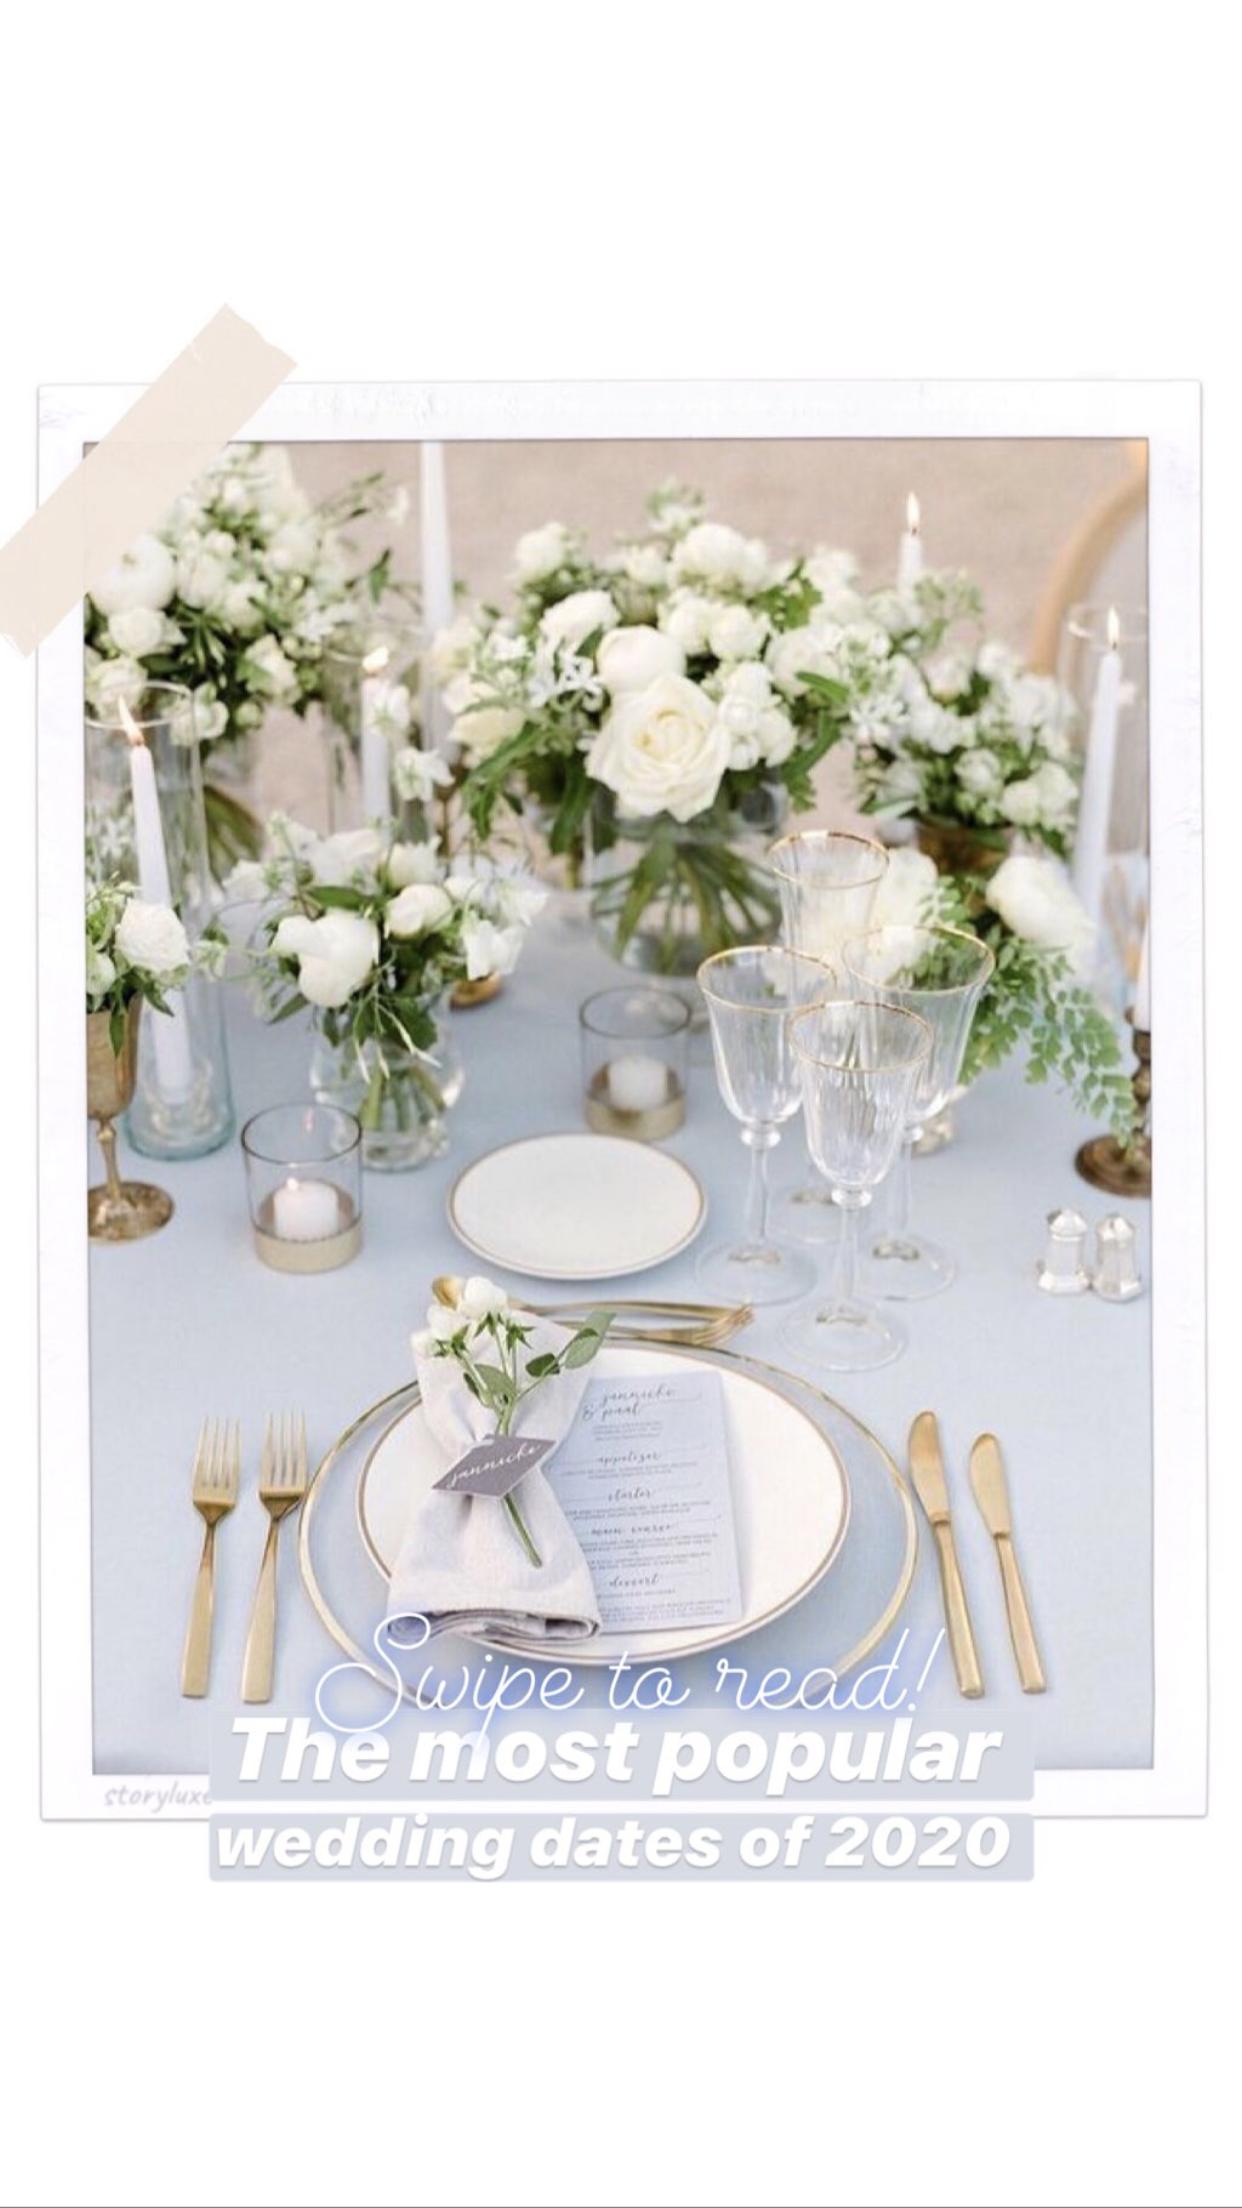 THE MOST POPULAR 2020 WEDDING DATES Wedding flowers